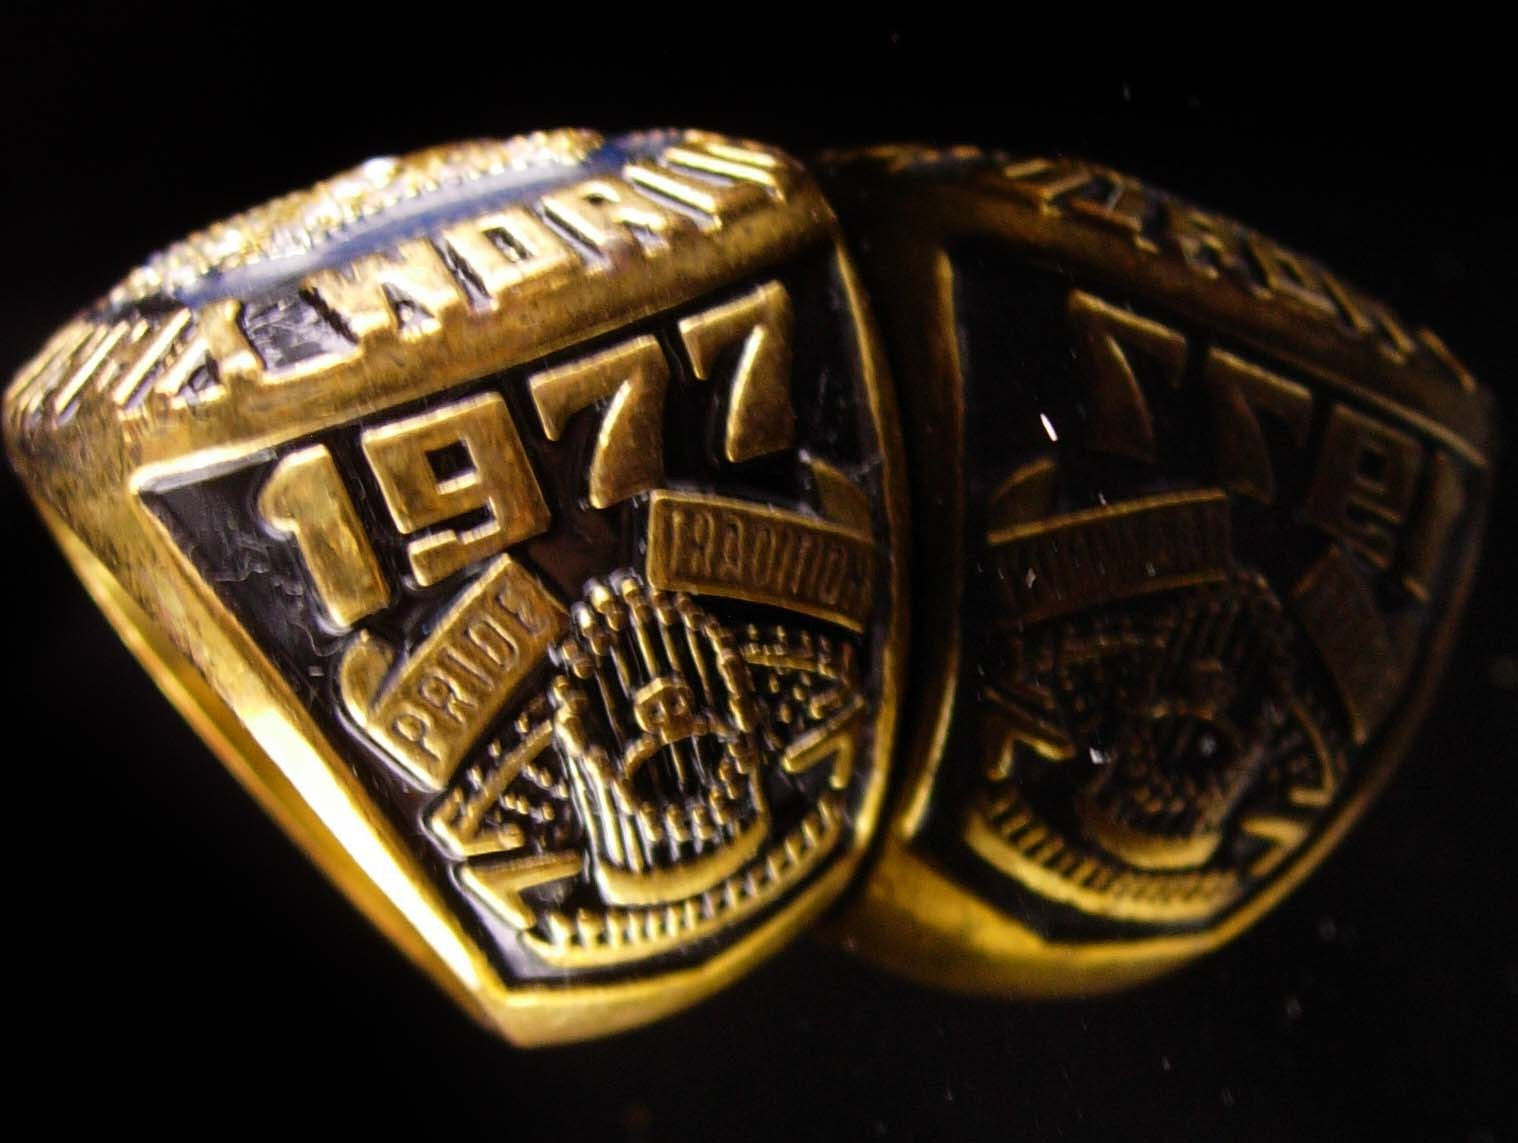 Vintage Baseball Ring - 1977 championship - New York Coach gift -  Yankees